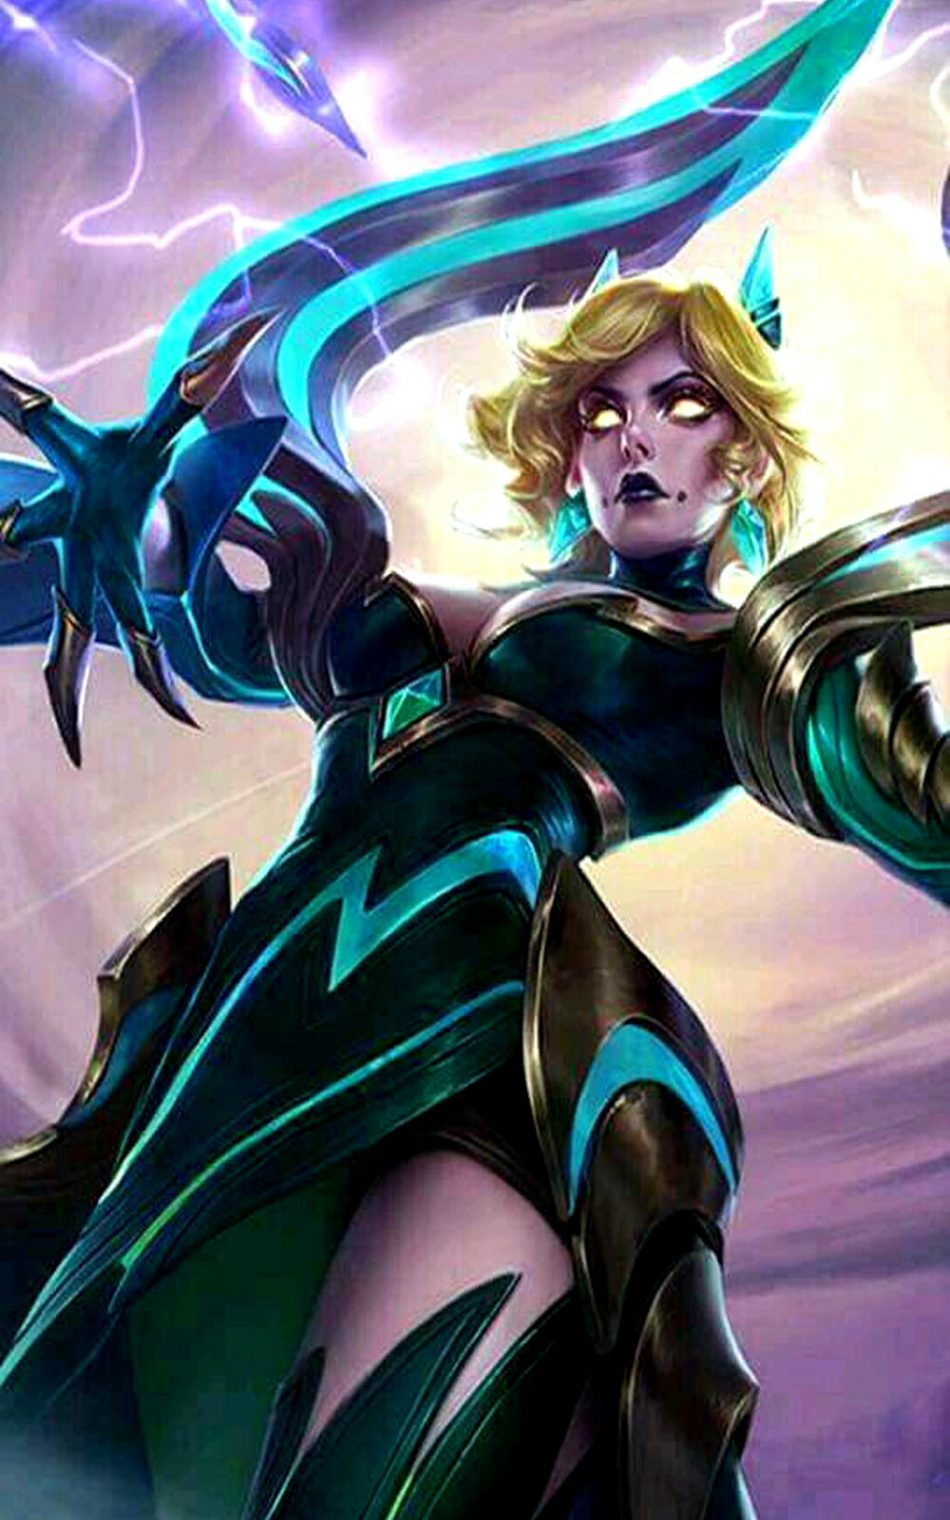 Download Emerald Enchantress Eudora Mobile Legends Free Pure